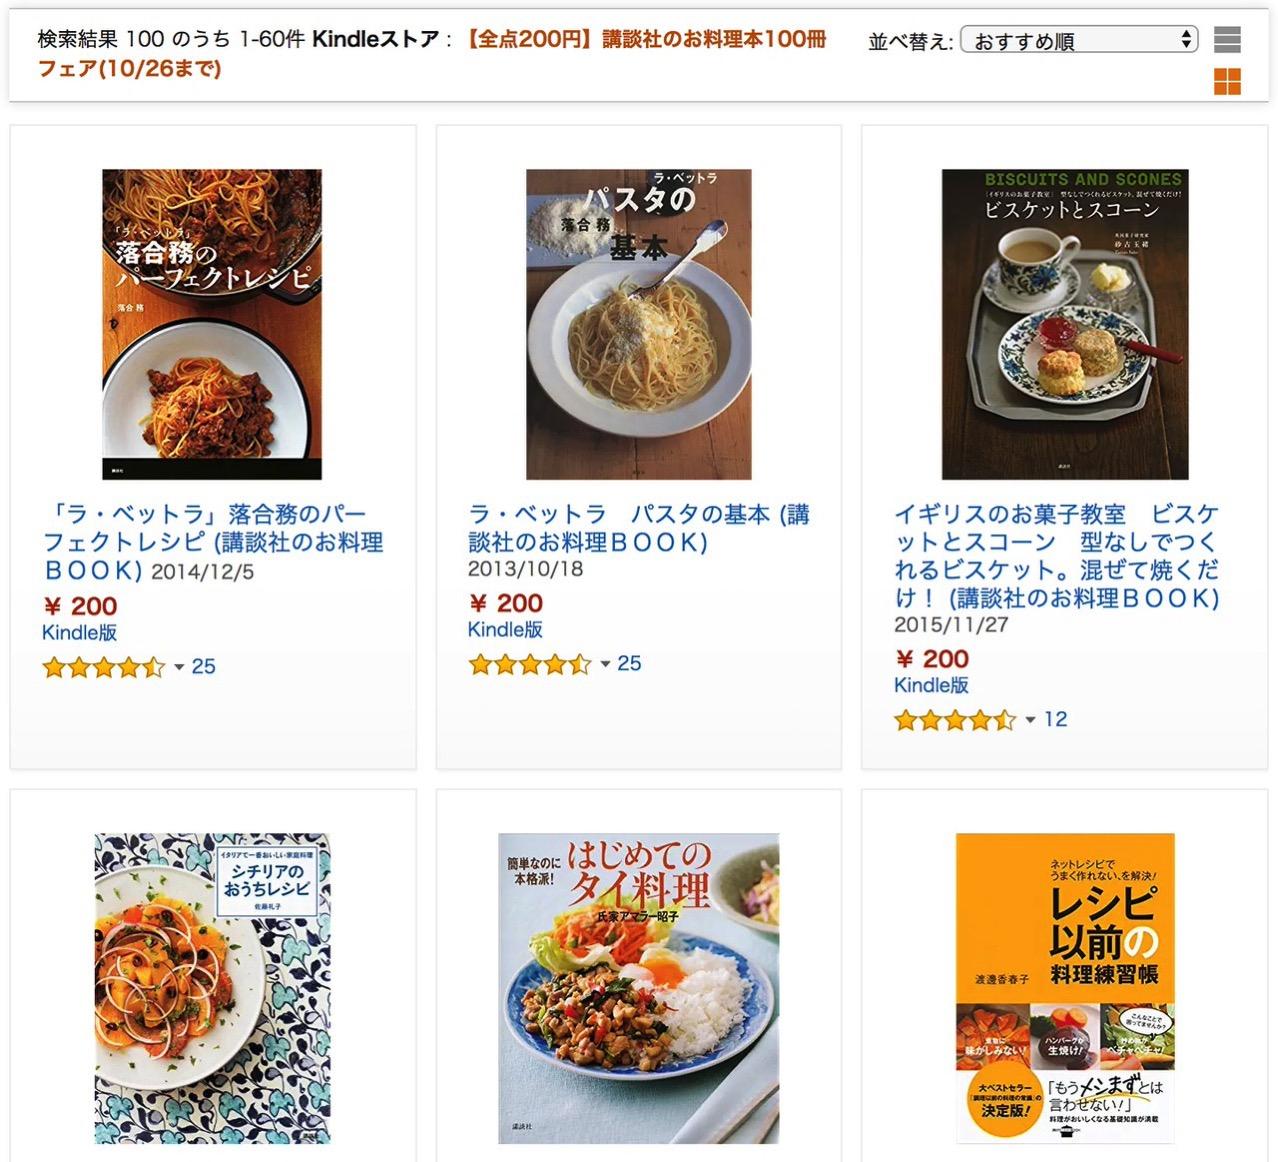 【Kindleセール】全点200円「講談社のお料理本100冊フェア」(10/26まで)